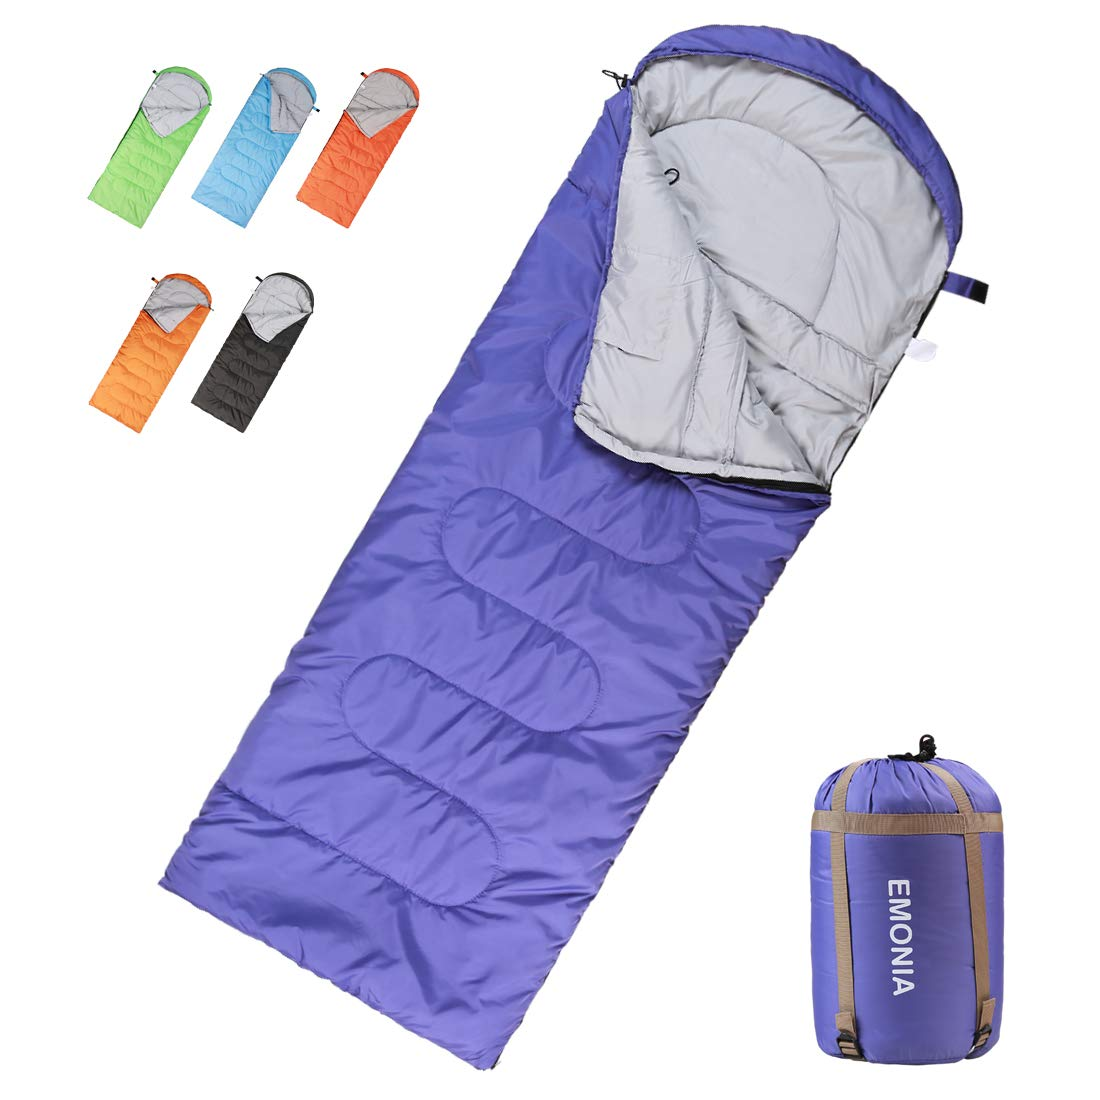 Emonia キャンプ寝袋 3シーズン 防水 アウトドア ハイキング バックパッキング 寝袋 旅行に最適 軽量 ポータブル 封筒型寝袋 大人 子供 女の子 男の子 B07C8H1W1H Purple - Left Zip Semi-Rectangular Semi-Rectangular|Purple - Left Zip